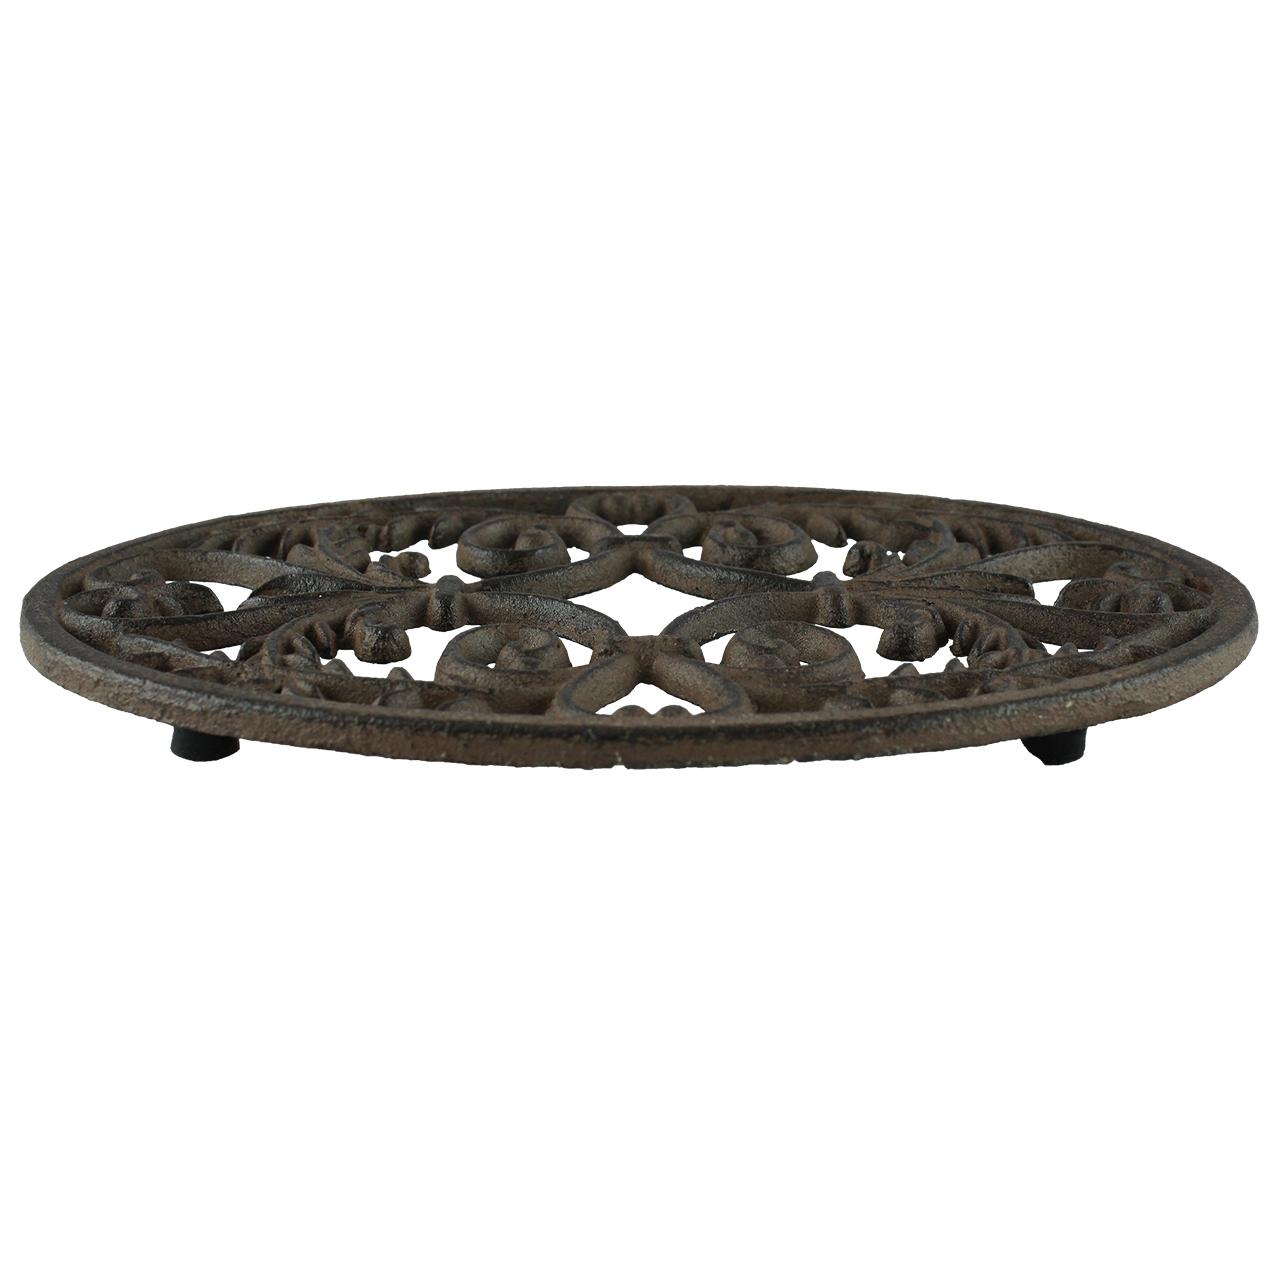 Suport Rotund Pentru Vase Fierbinti Din Metal Maro